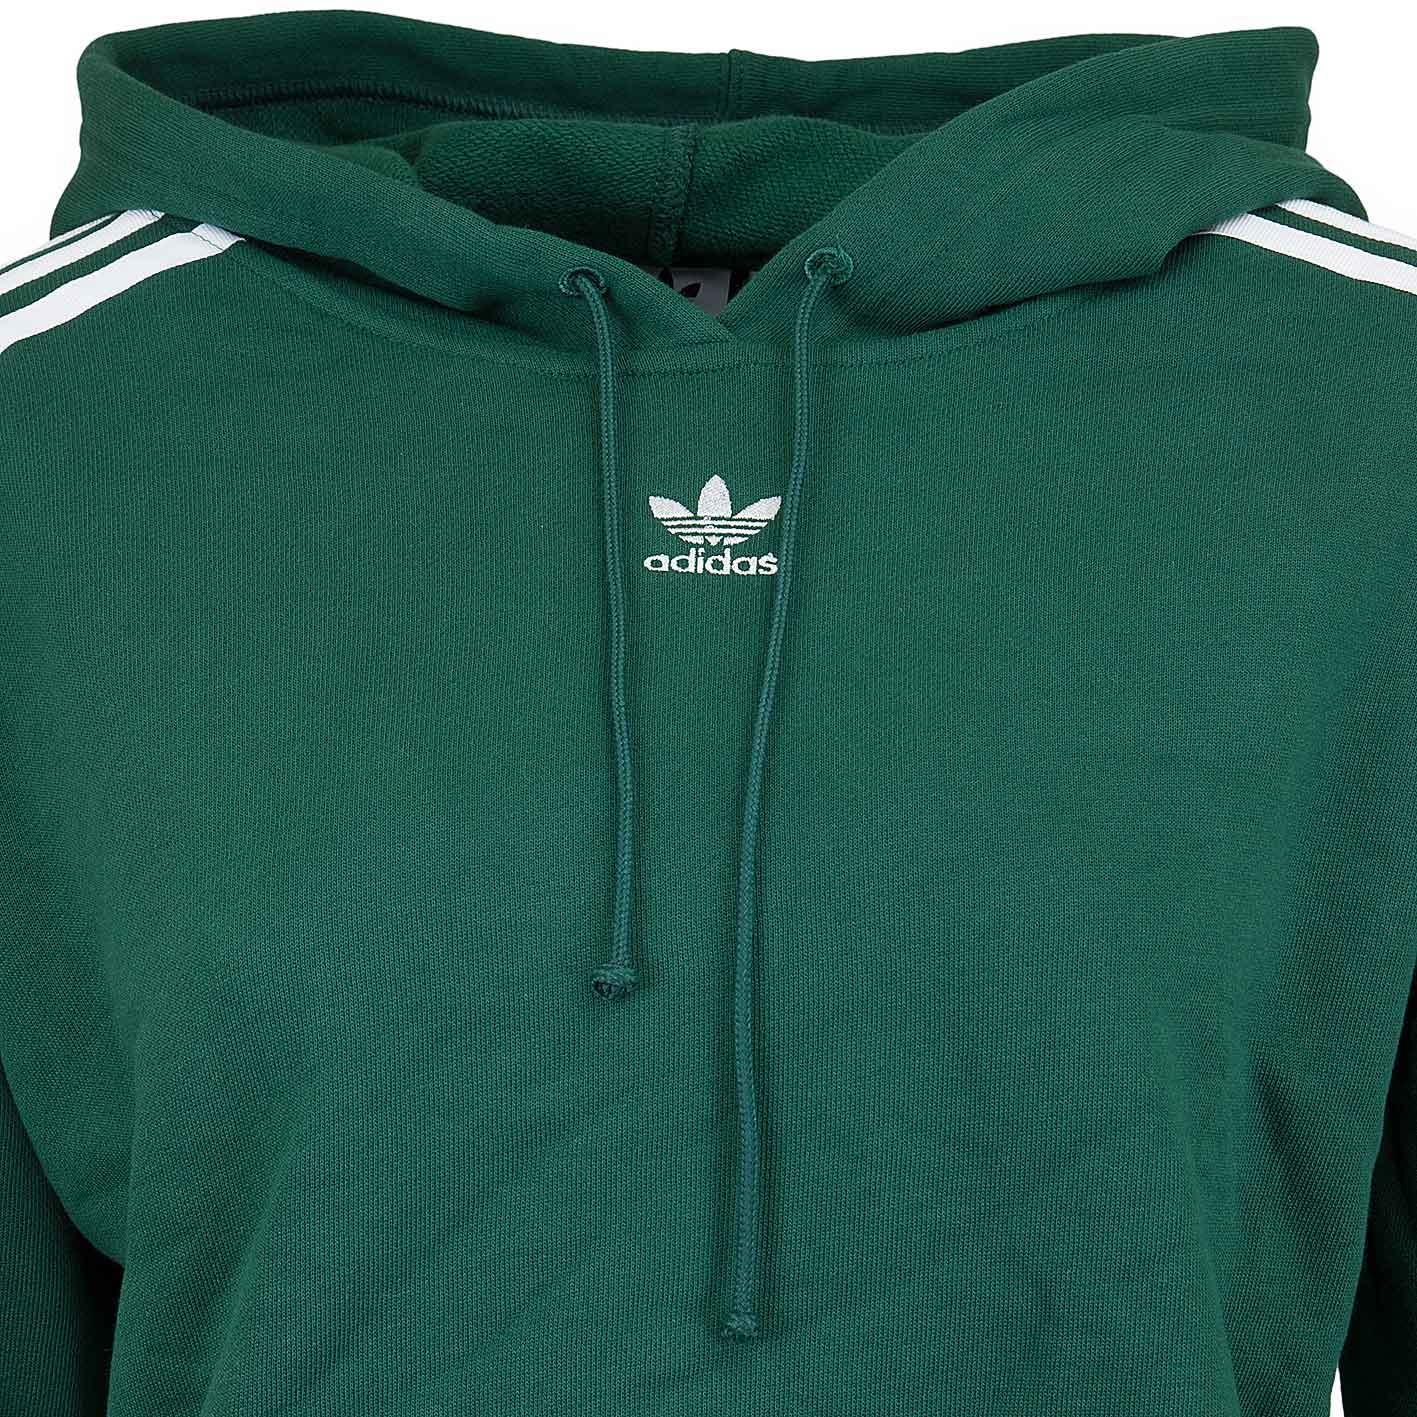 reasonably priced skate shoes best supplier Adidas Originals Damen Hoody Cropped grün